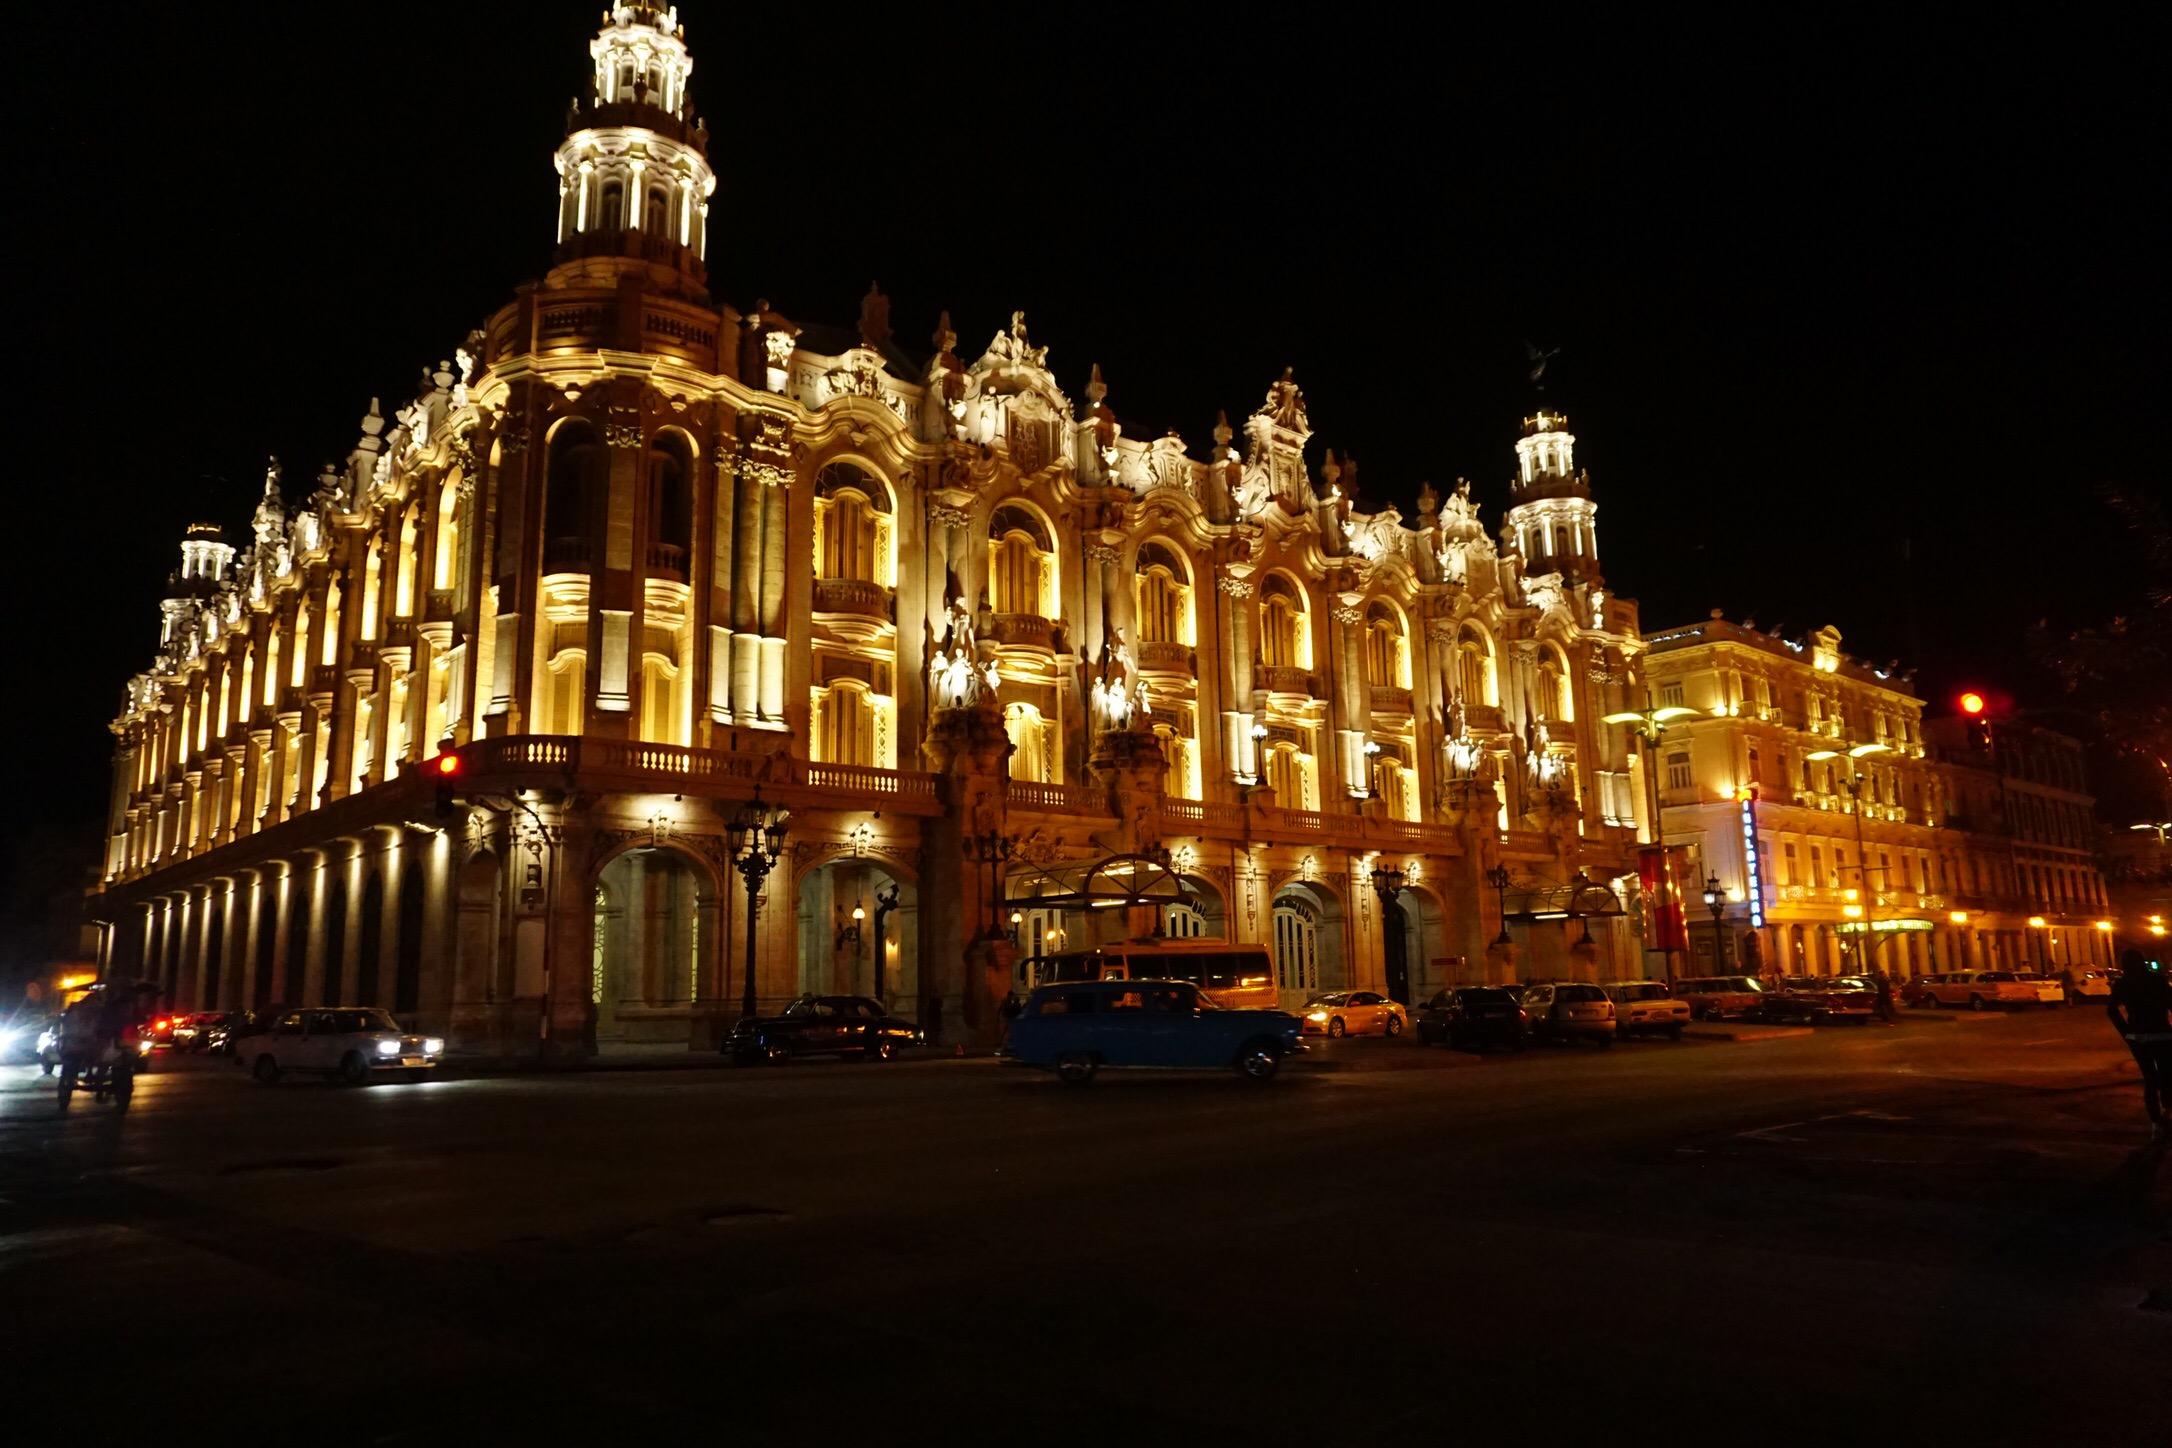 Gran Teatro de la Habana by night before hurricane Irma